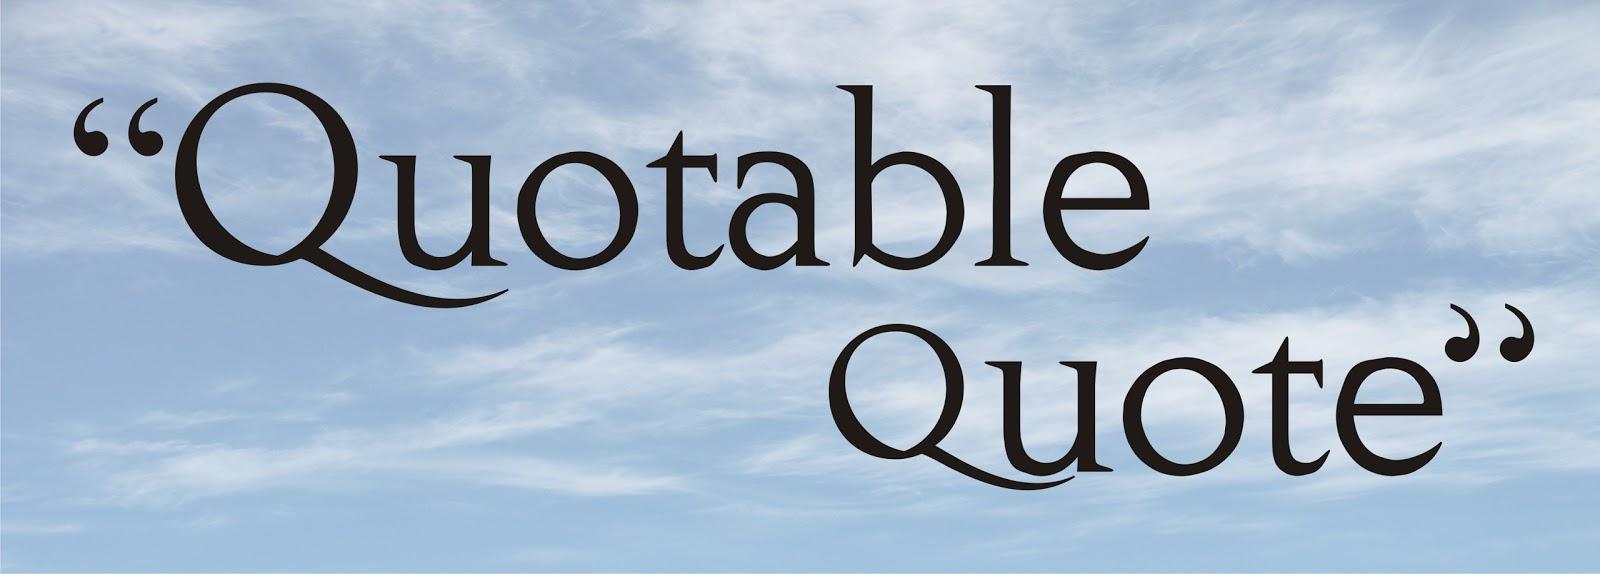 "Quotable Quotes"""